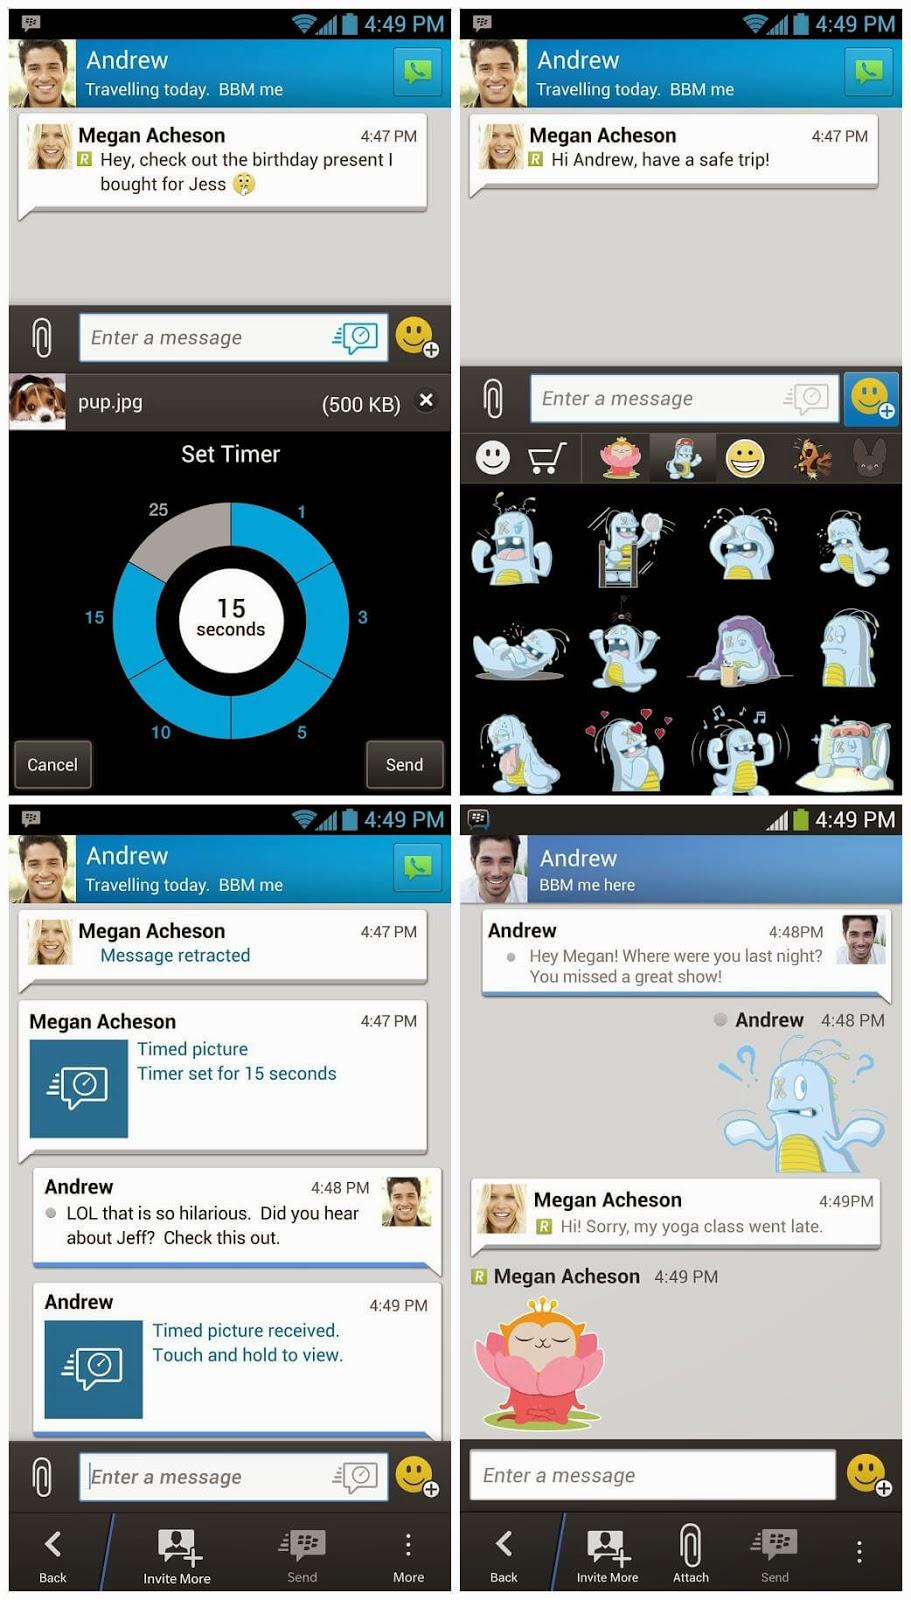 BBM Android v2.6.0.30 APK Terbaru